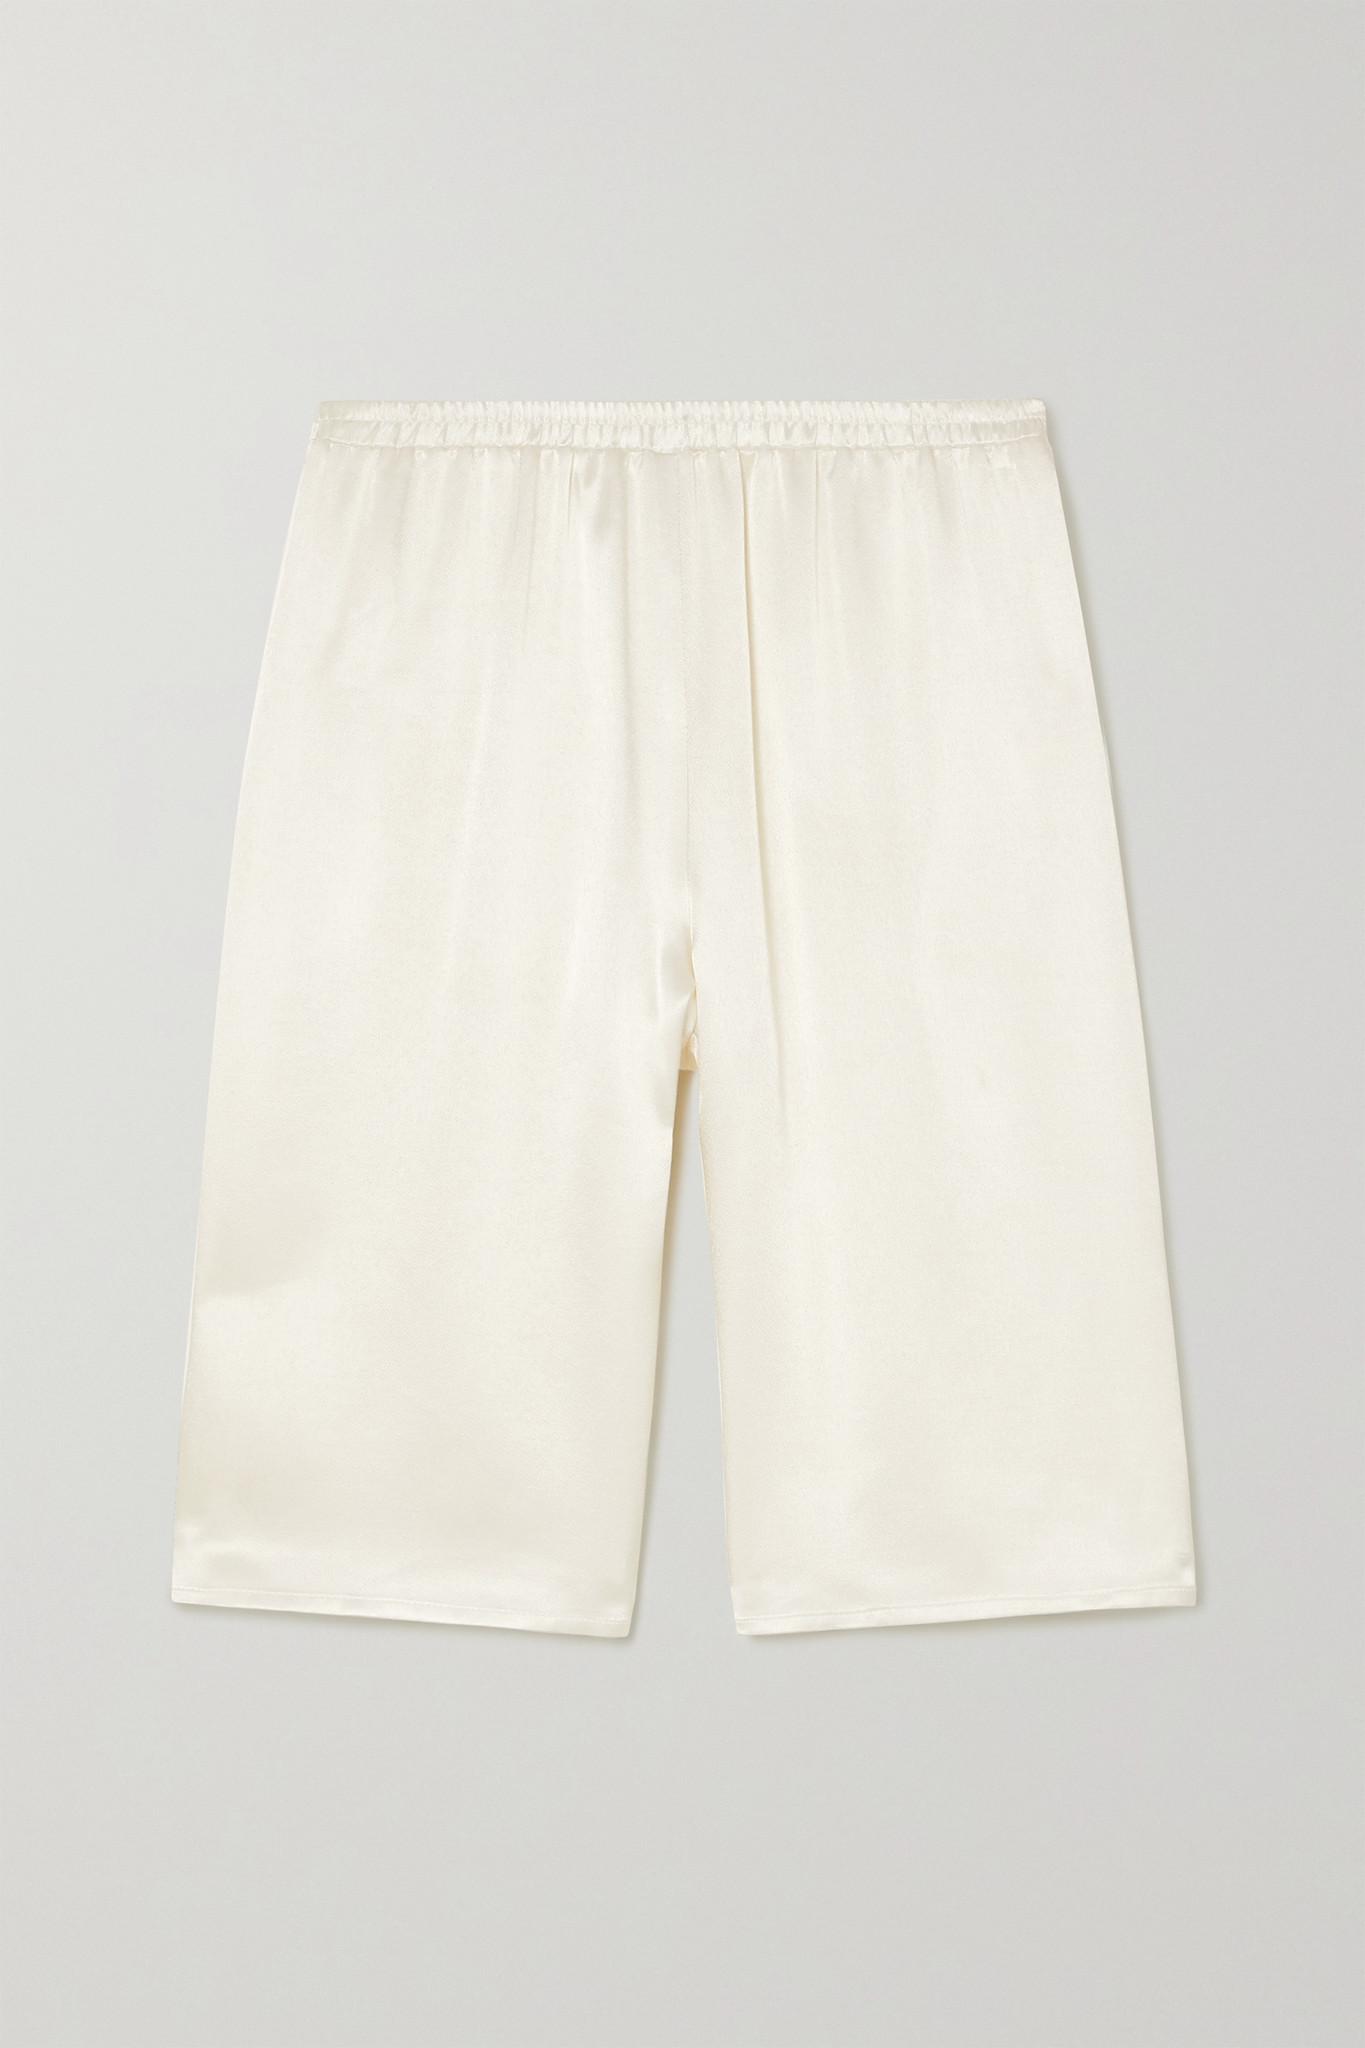 LAPOINTE - 缎布短裤 - 象牙色 - medium